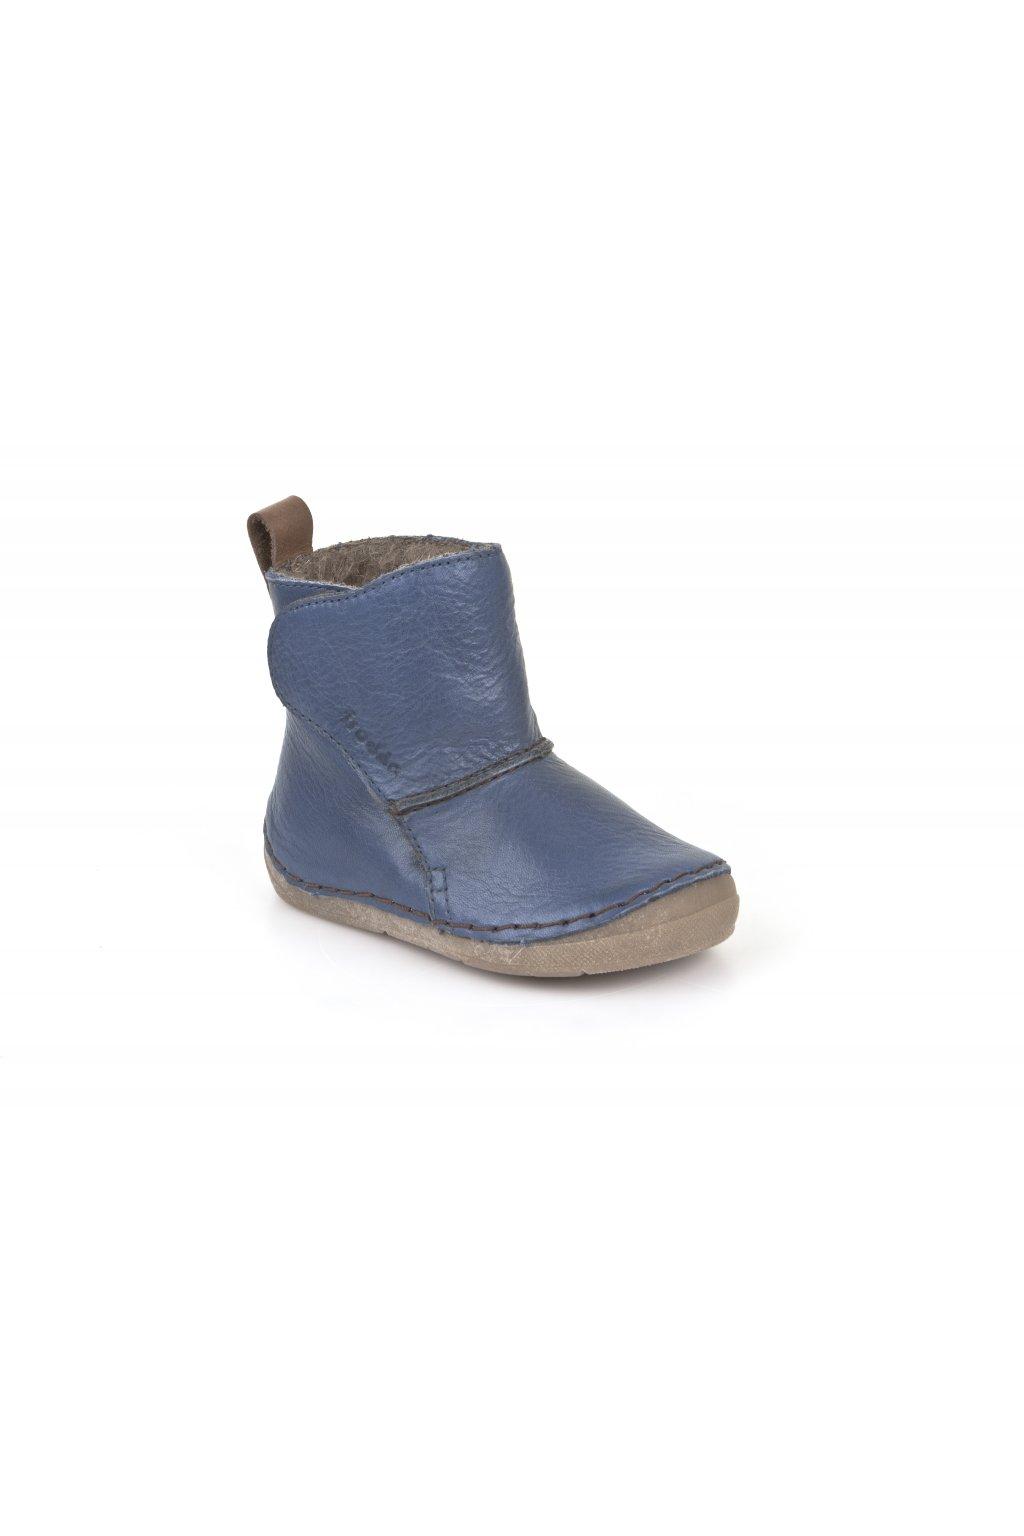 Froddo Boots Denim - Jahňacia Kožušina